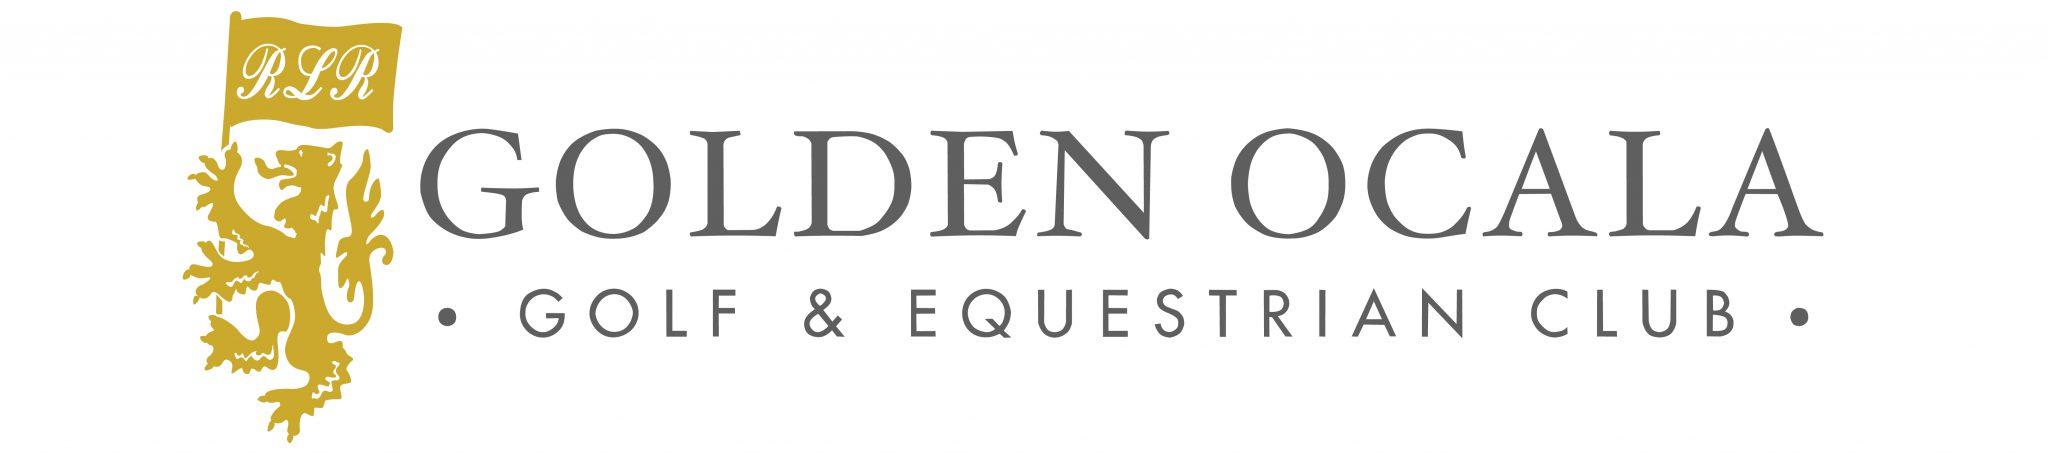 Golden Ocala Presents The 50 000 World Equestrian Center